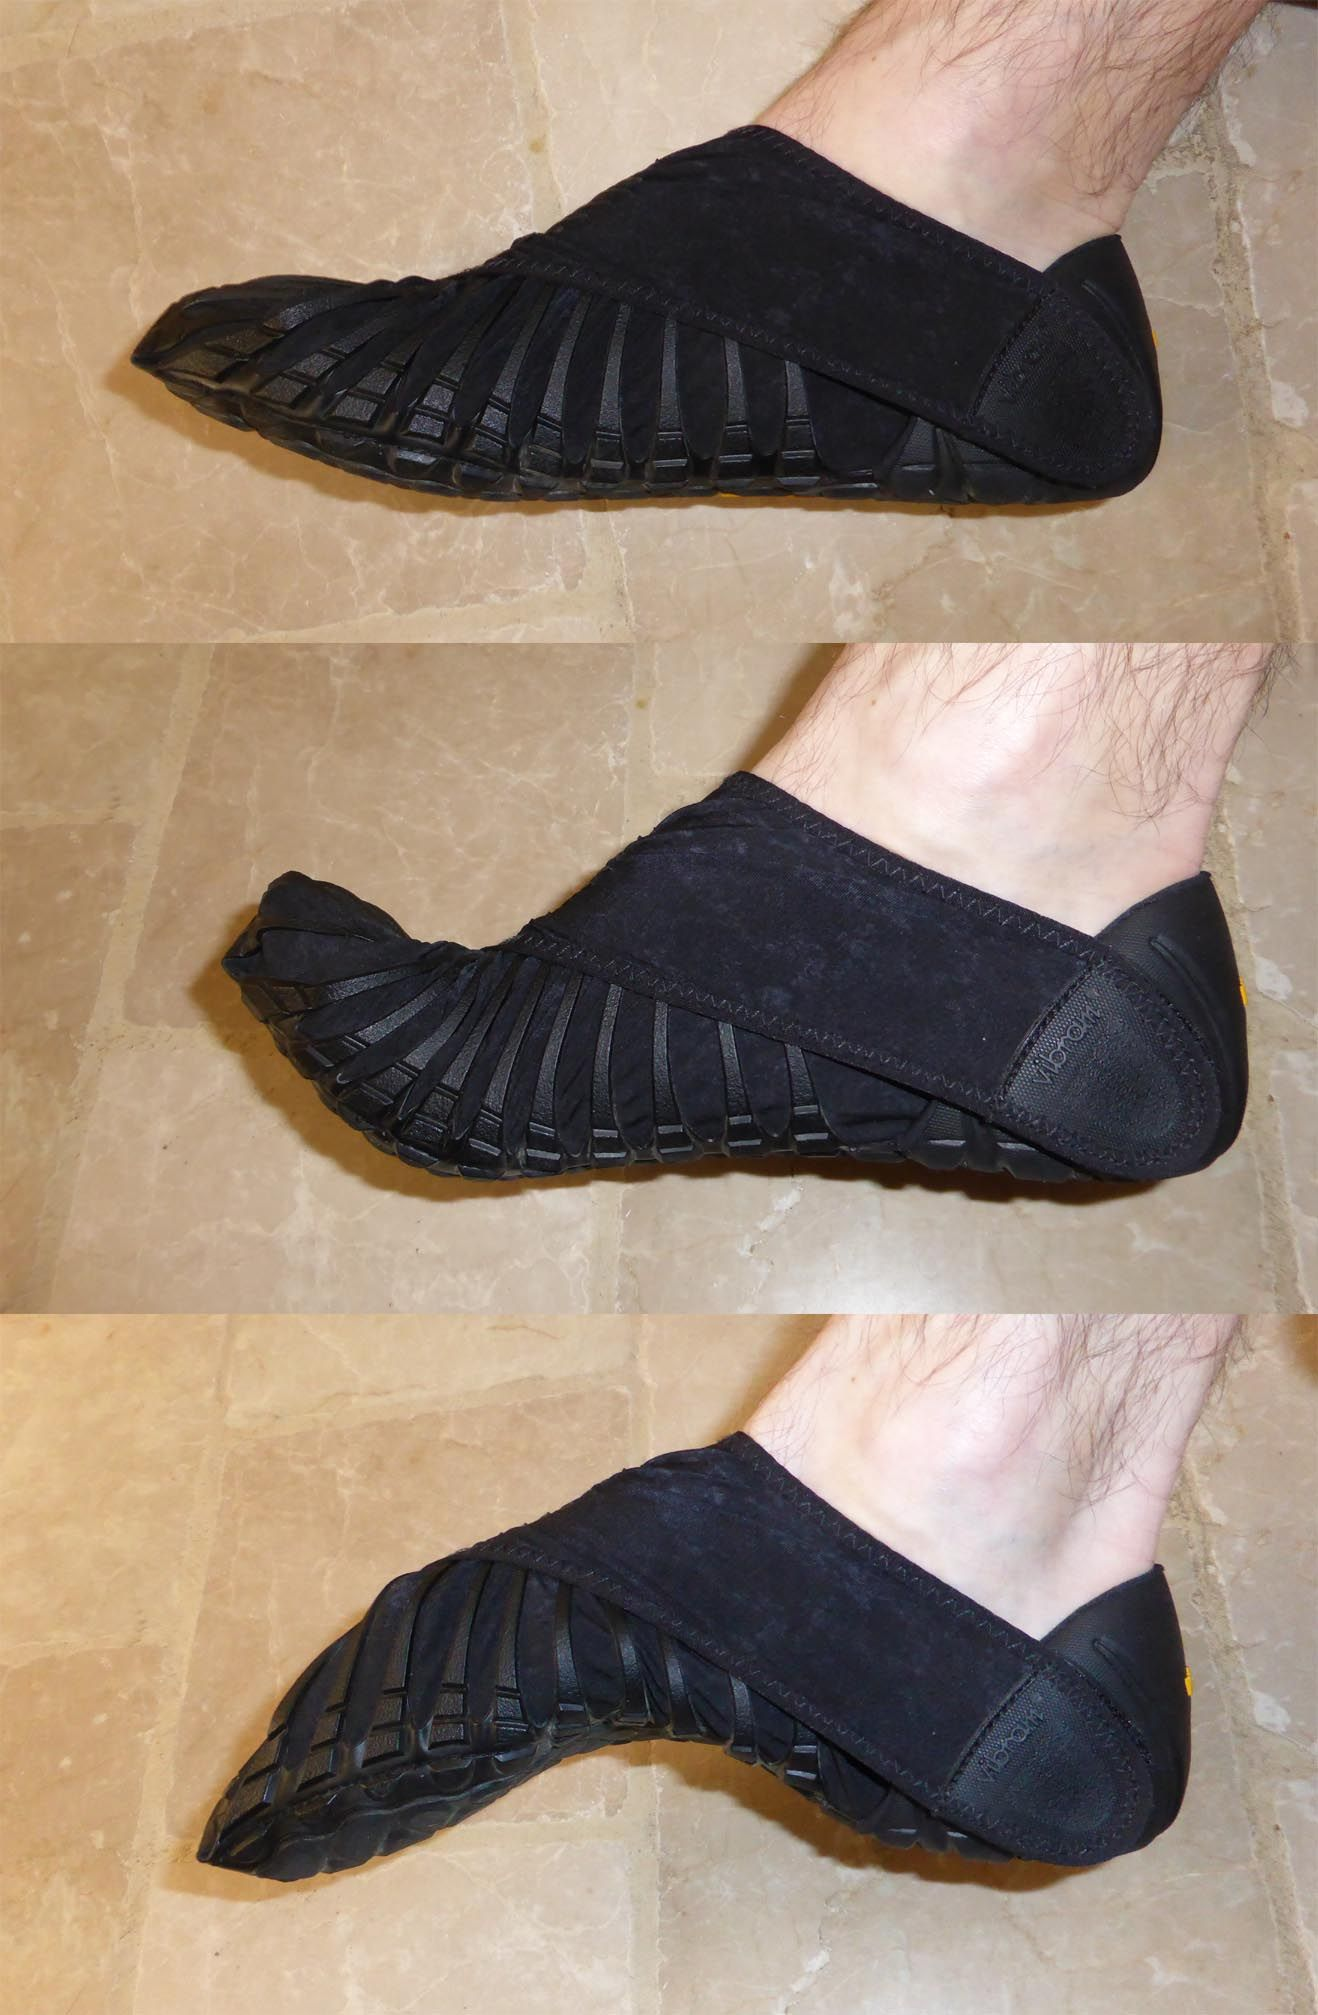 9ca87cd769 Vibram FiveFingers Furoshiki Originals - Unisex shoes | shoes ...